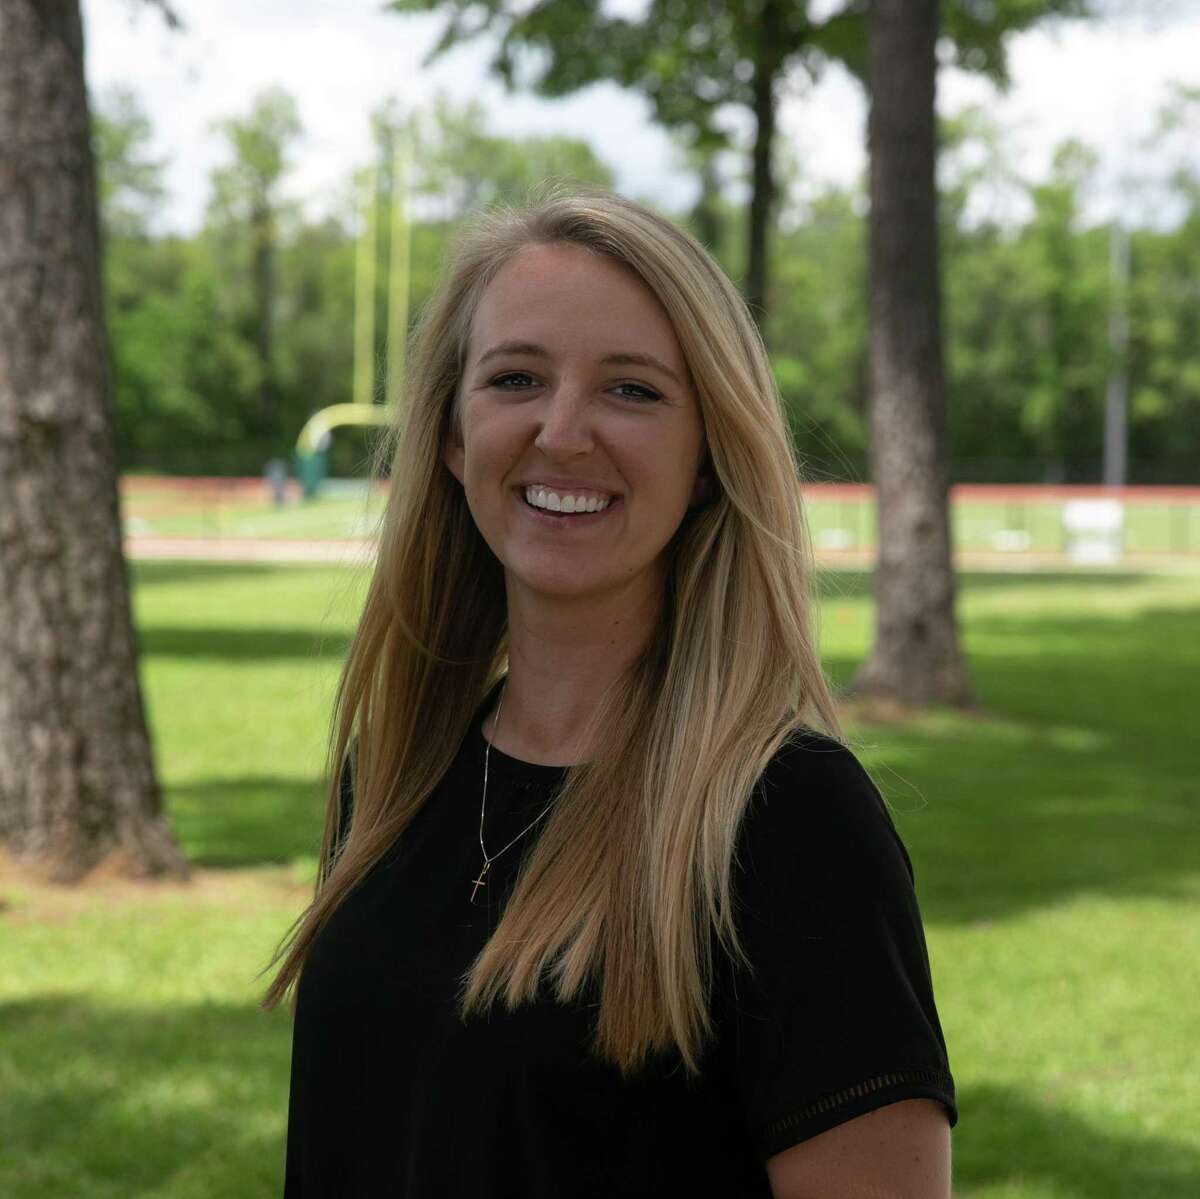 TWCA softball coach Kate Maddock